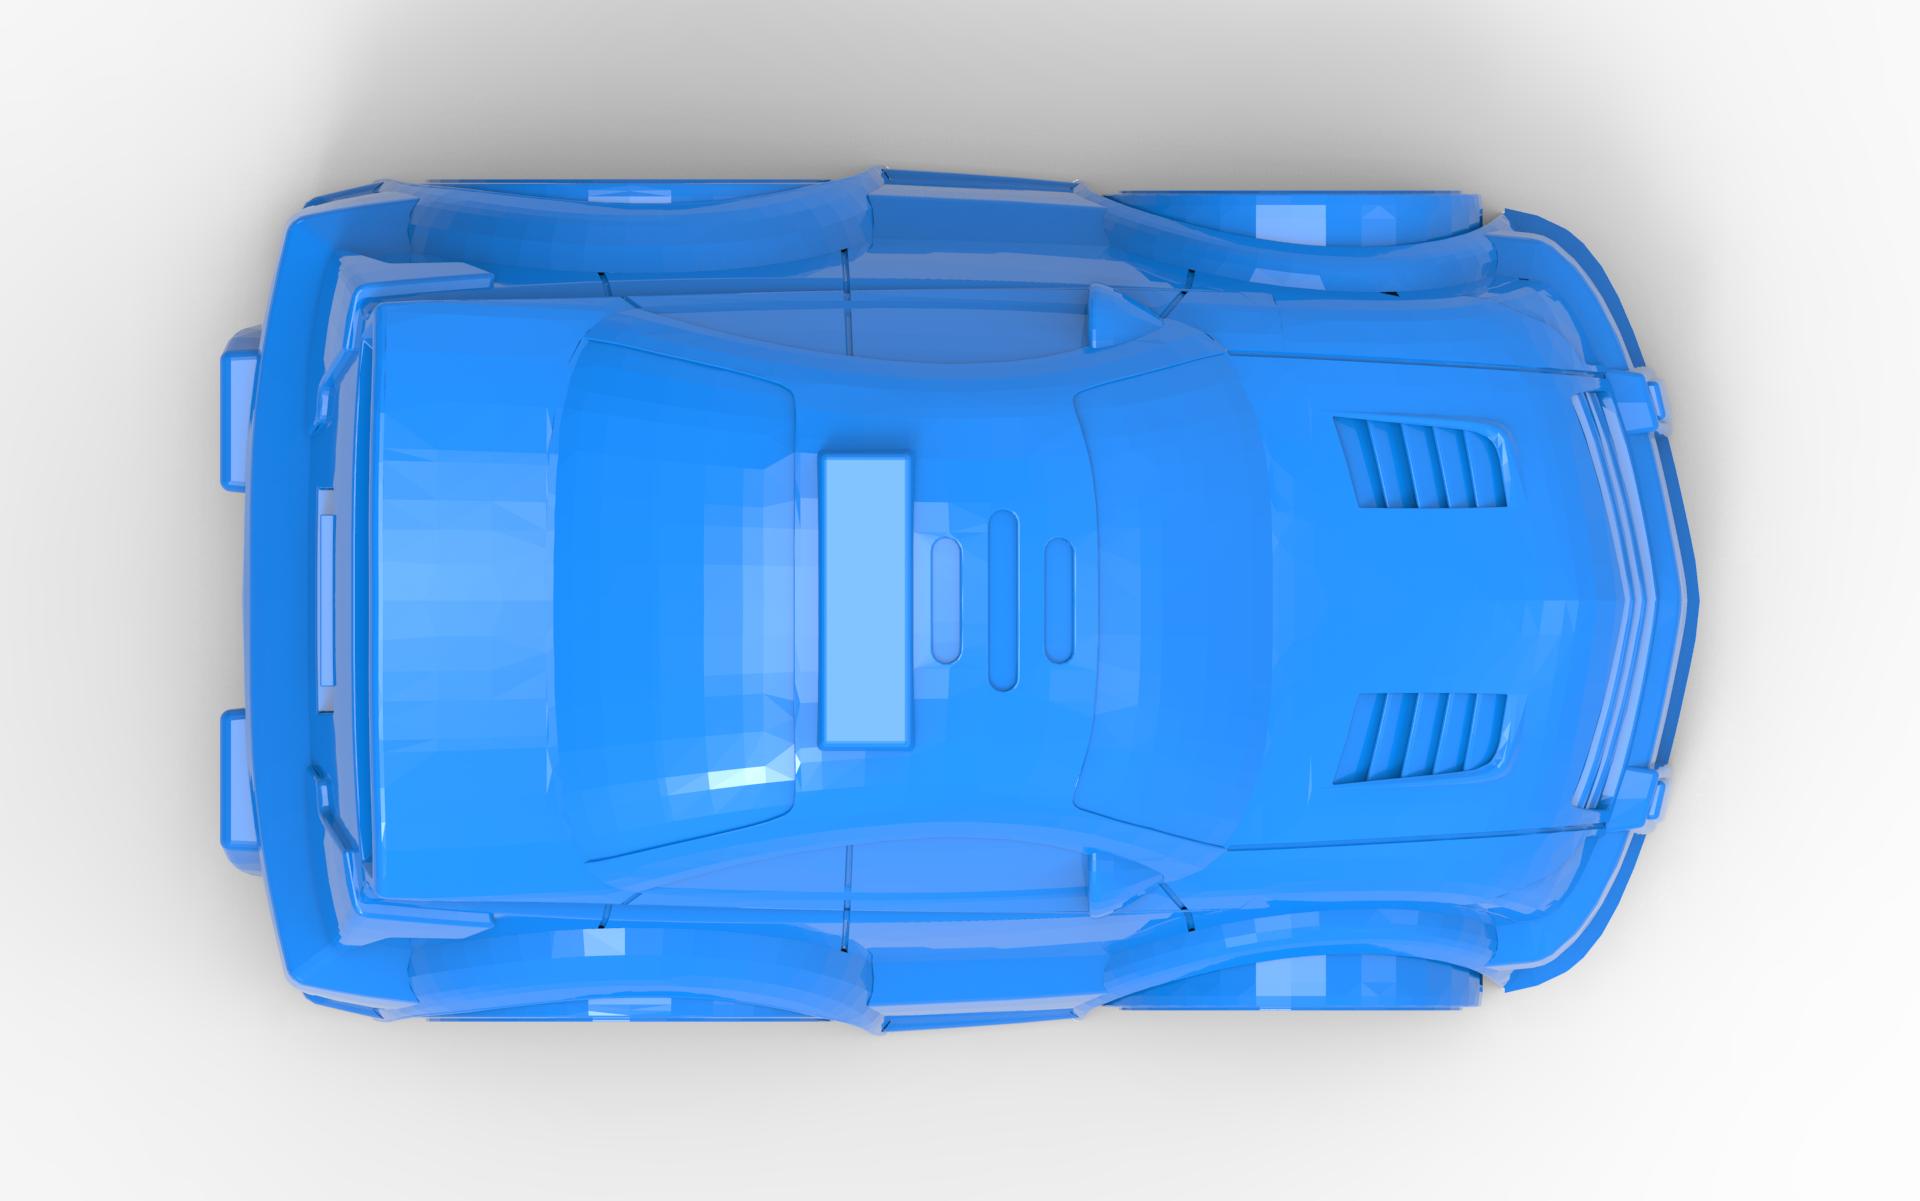 untitled.1580.png Download free STL file Police car • 3D printer design, hcchong